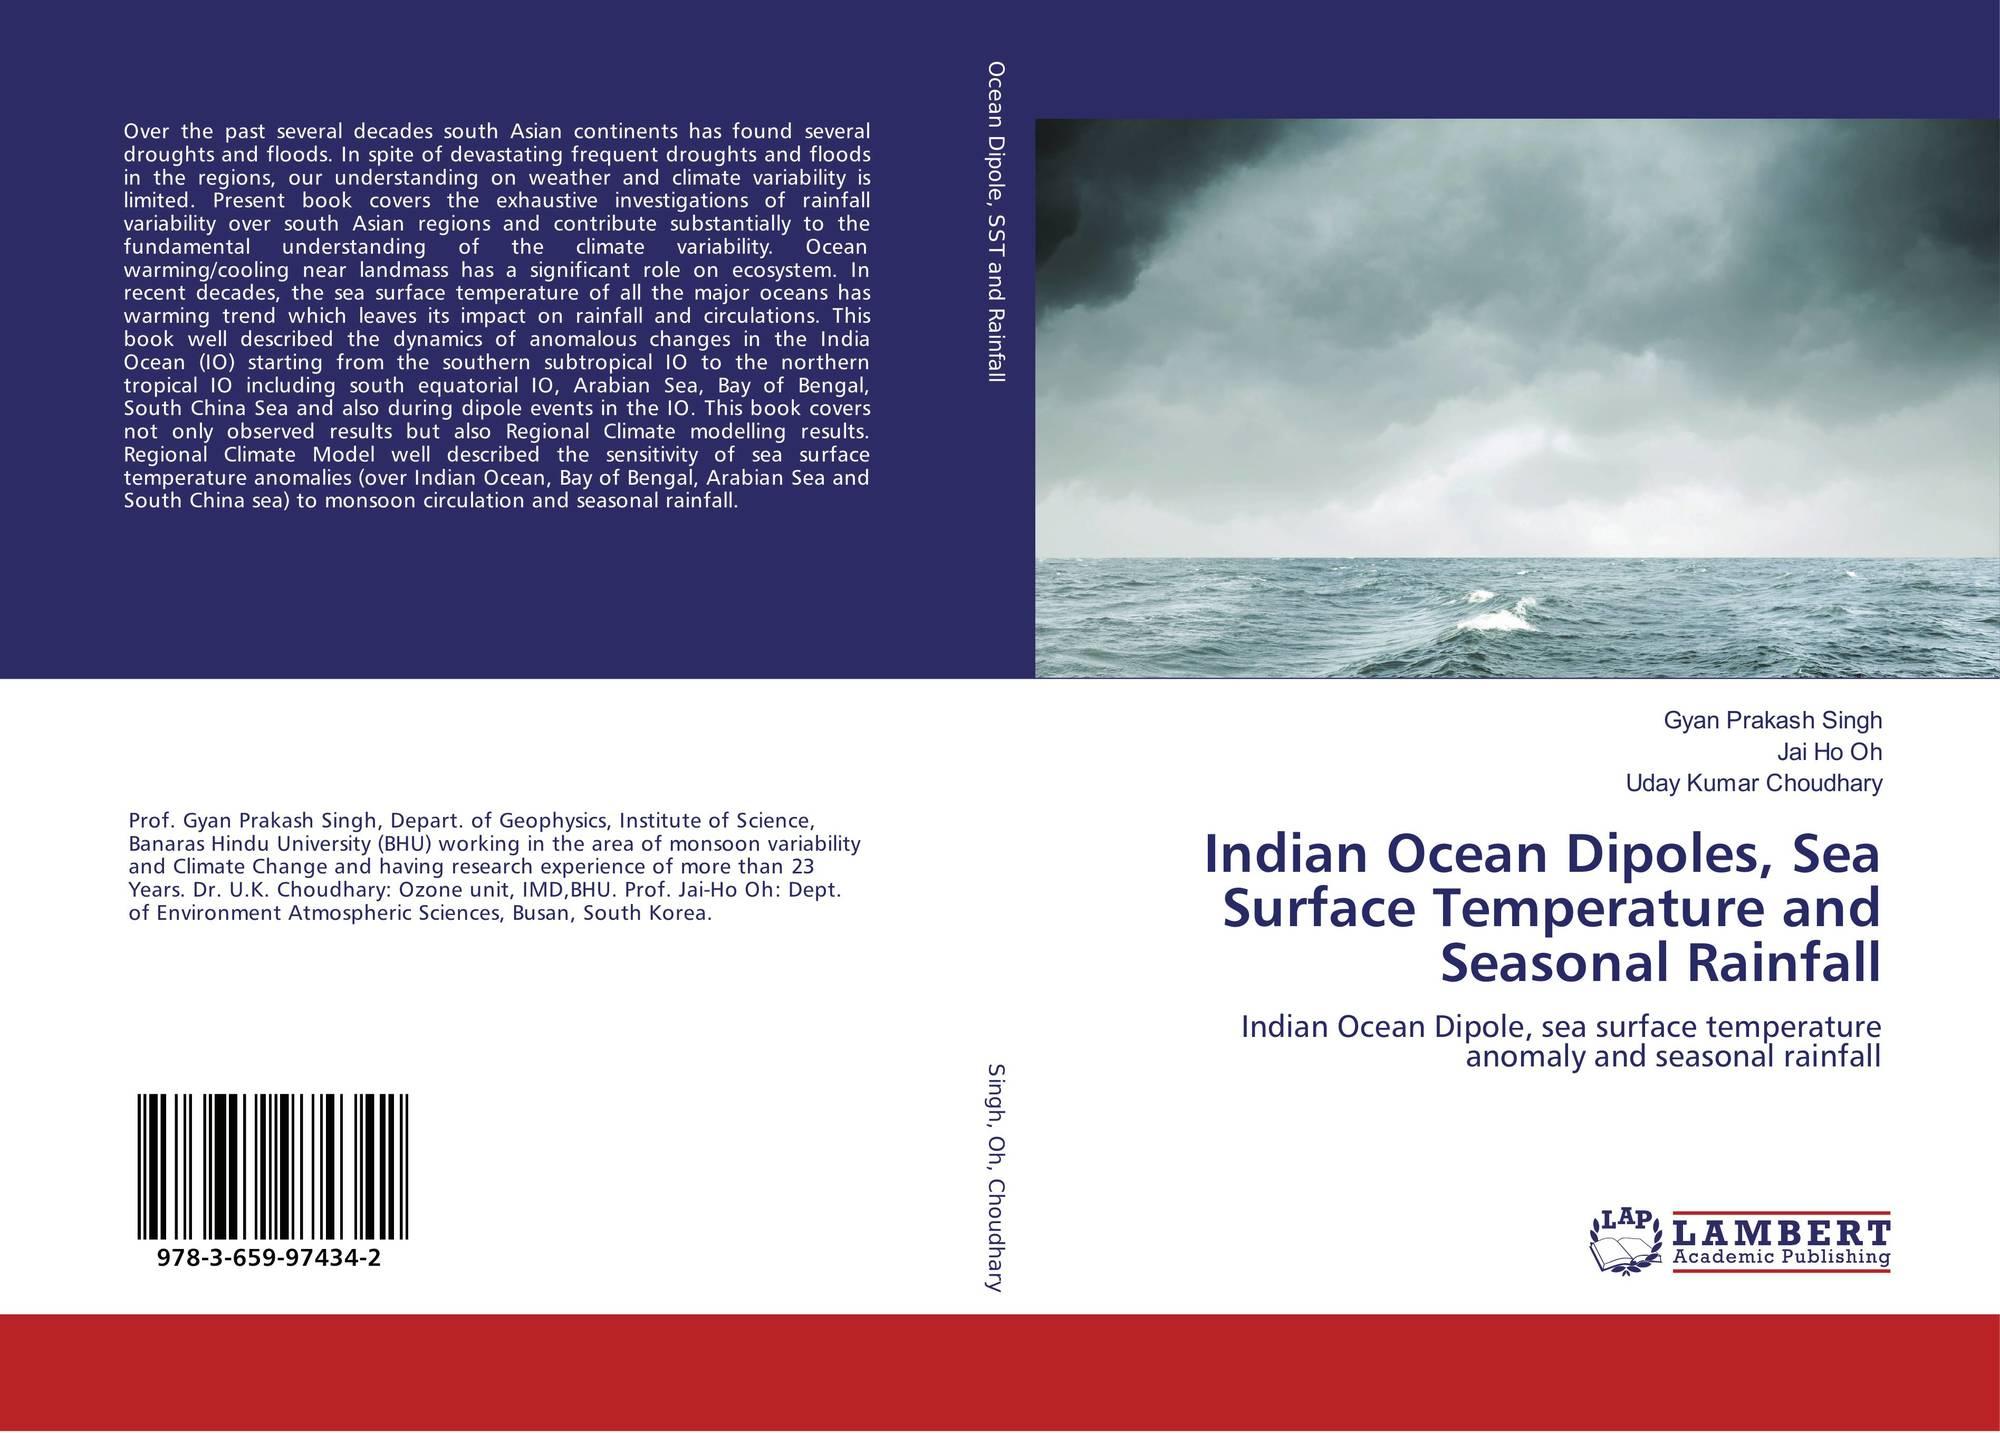 JACKLYN: Indian Dipoles